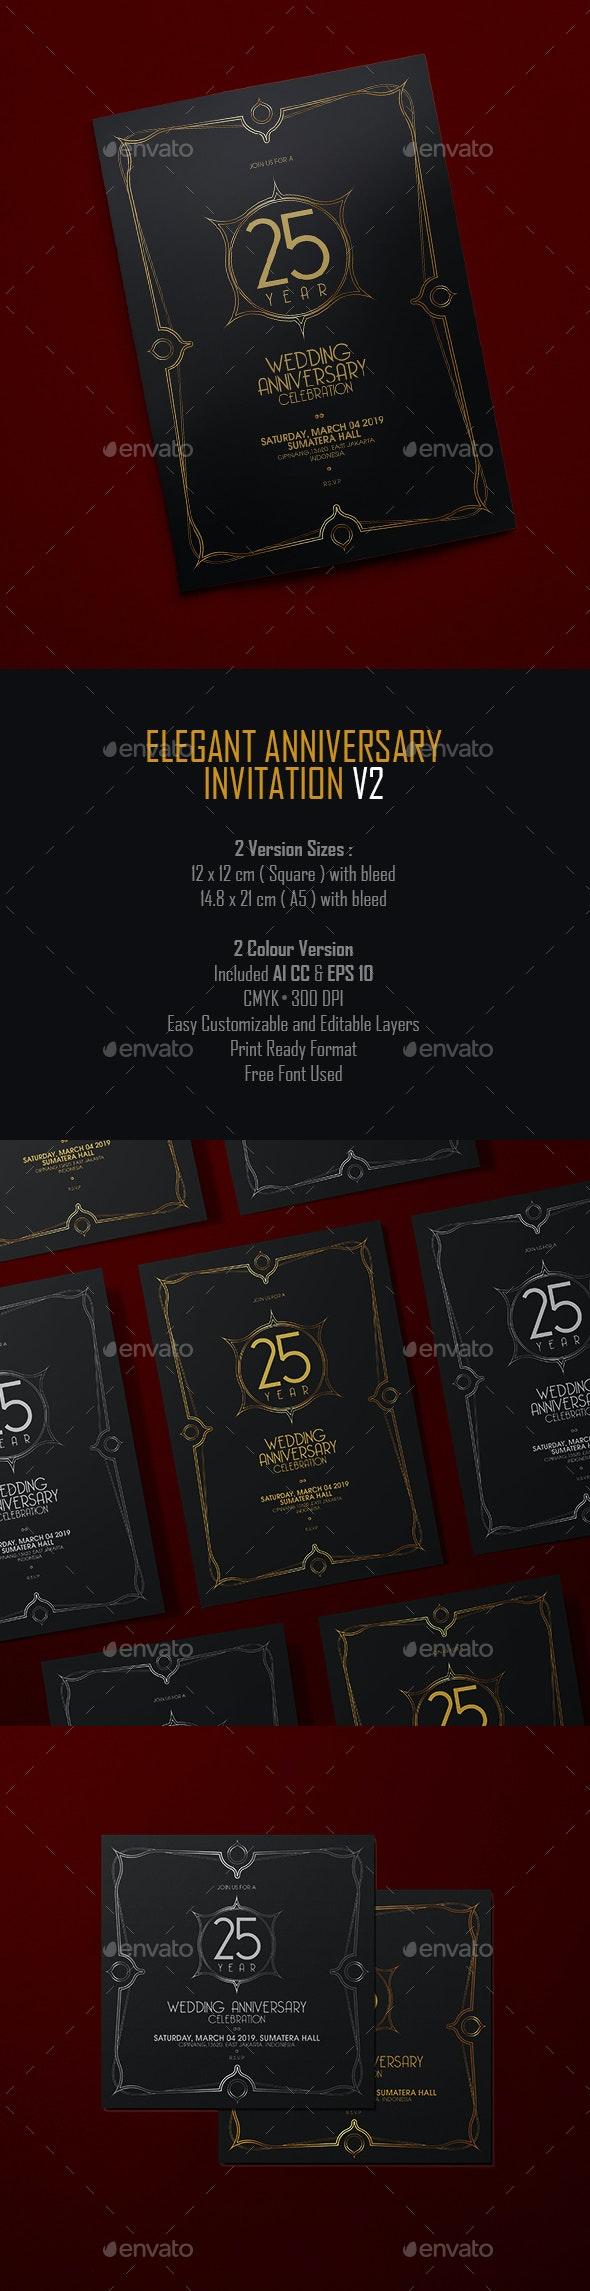 carte invitation élégante 2